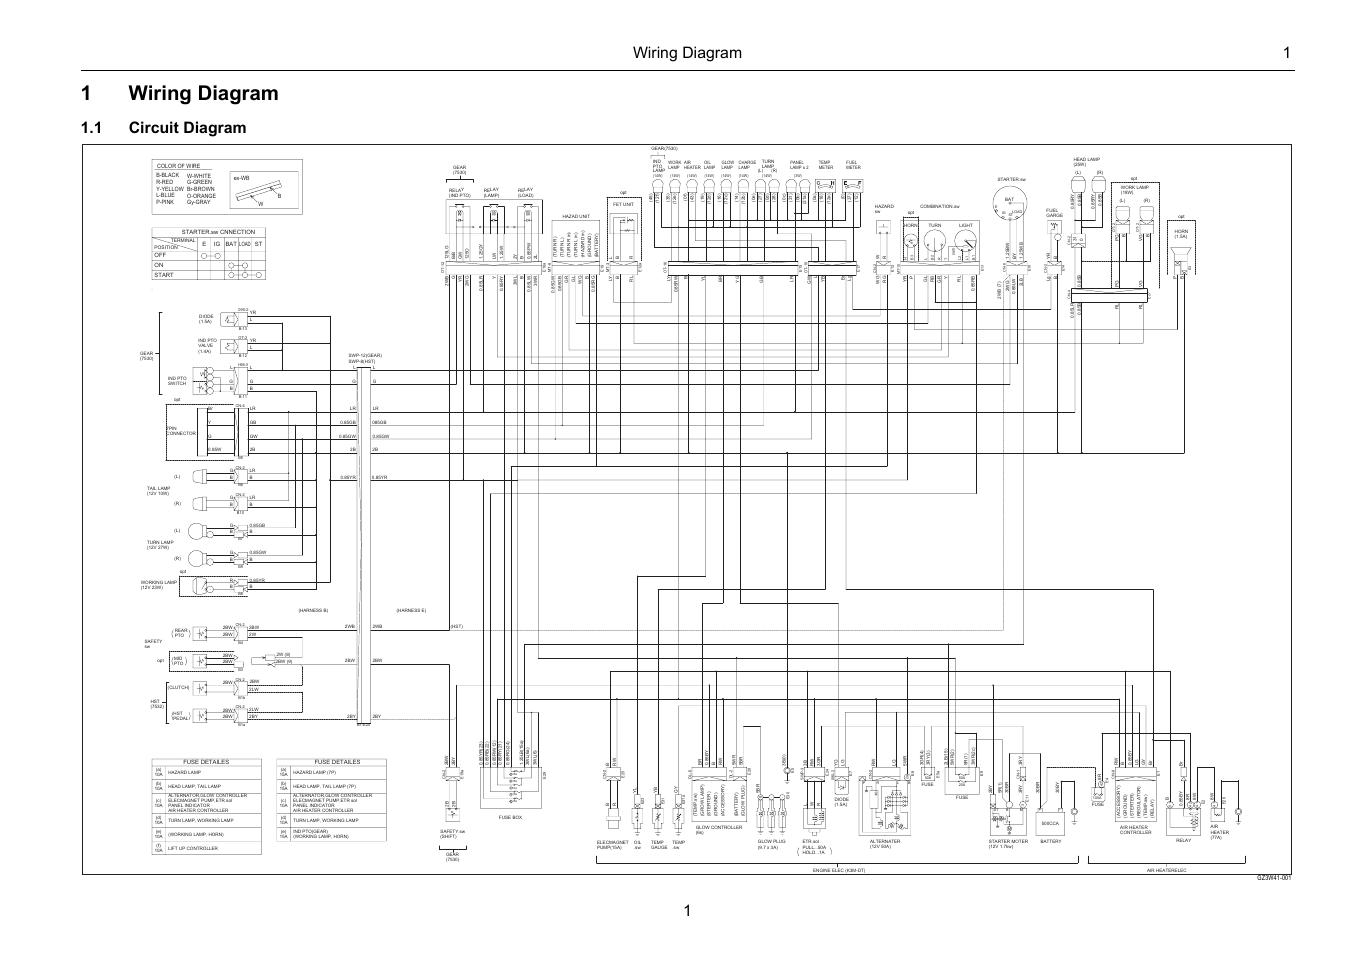 wiring diagramm alpha1 20 40n 150 1999 chevy tahoe engine diagram 1wiring 1 circuit